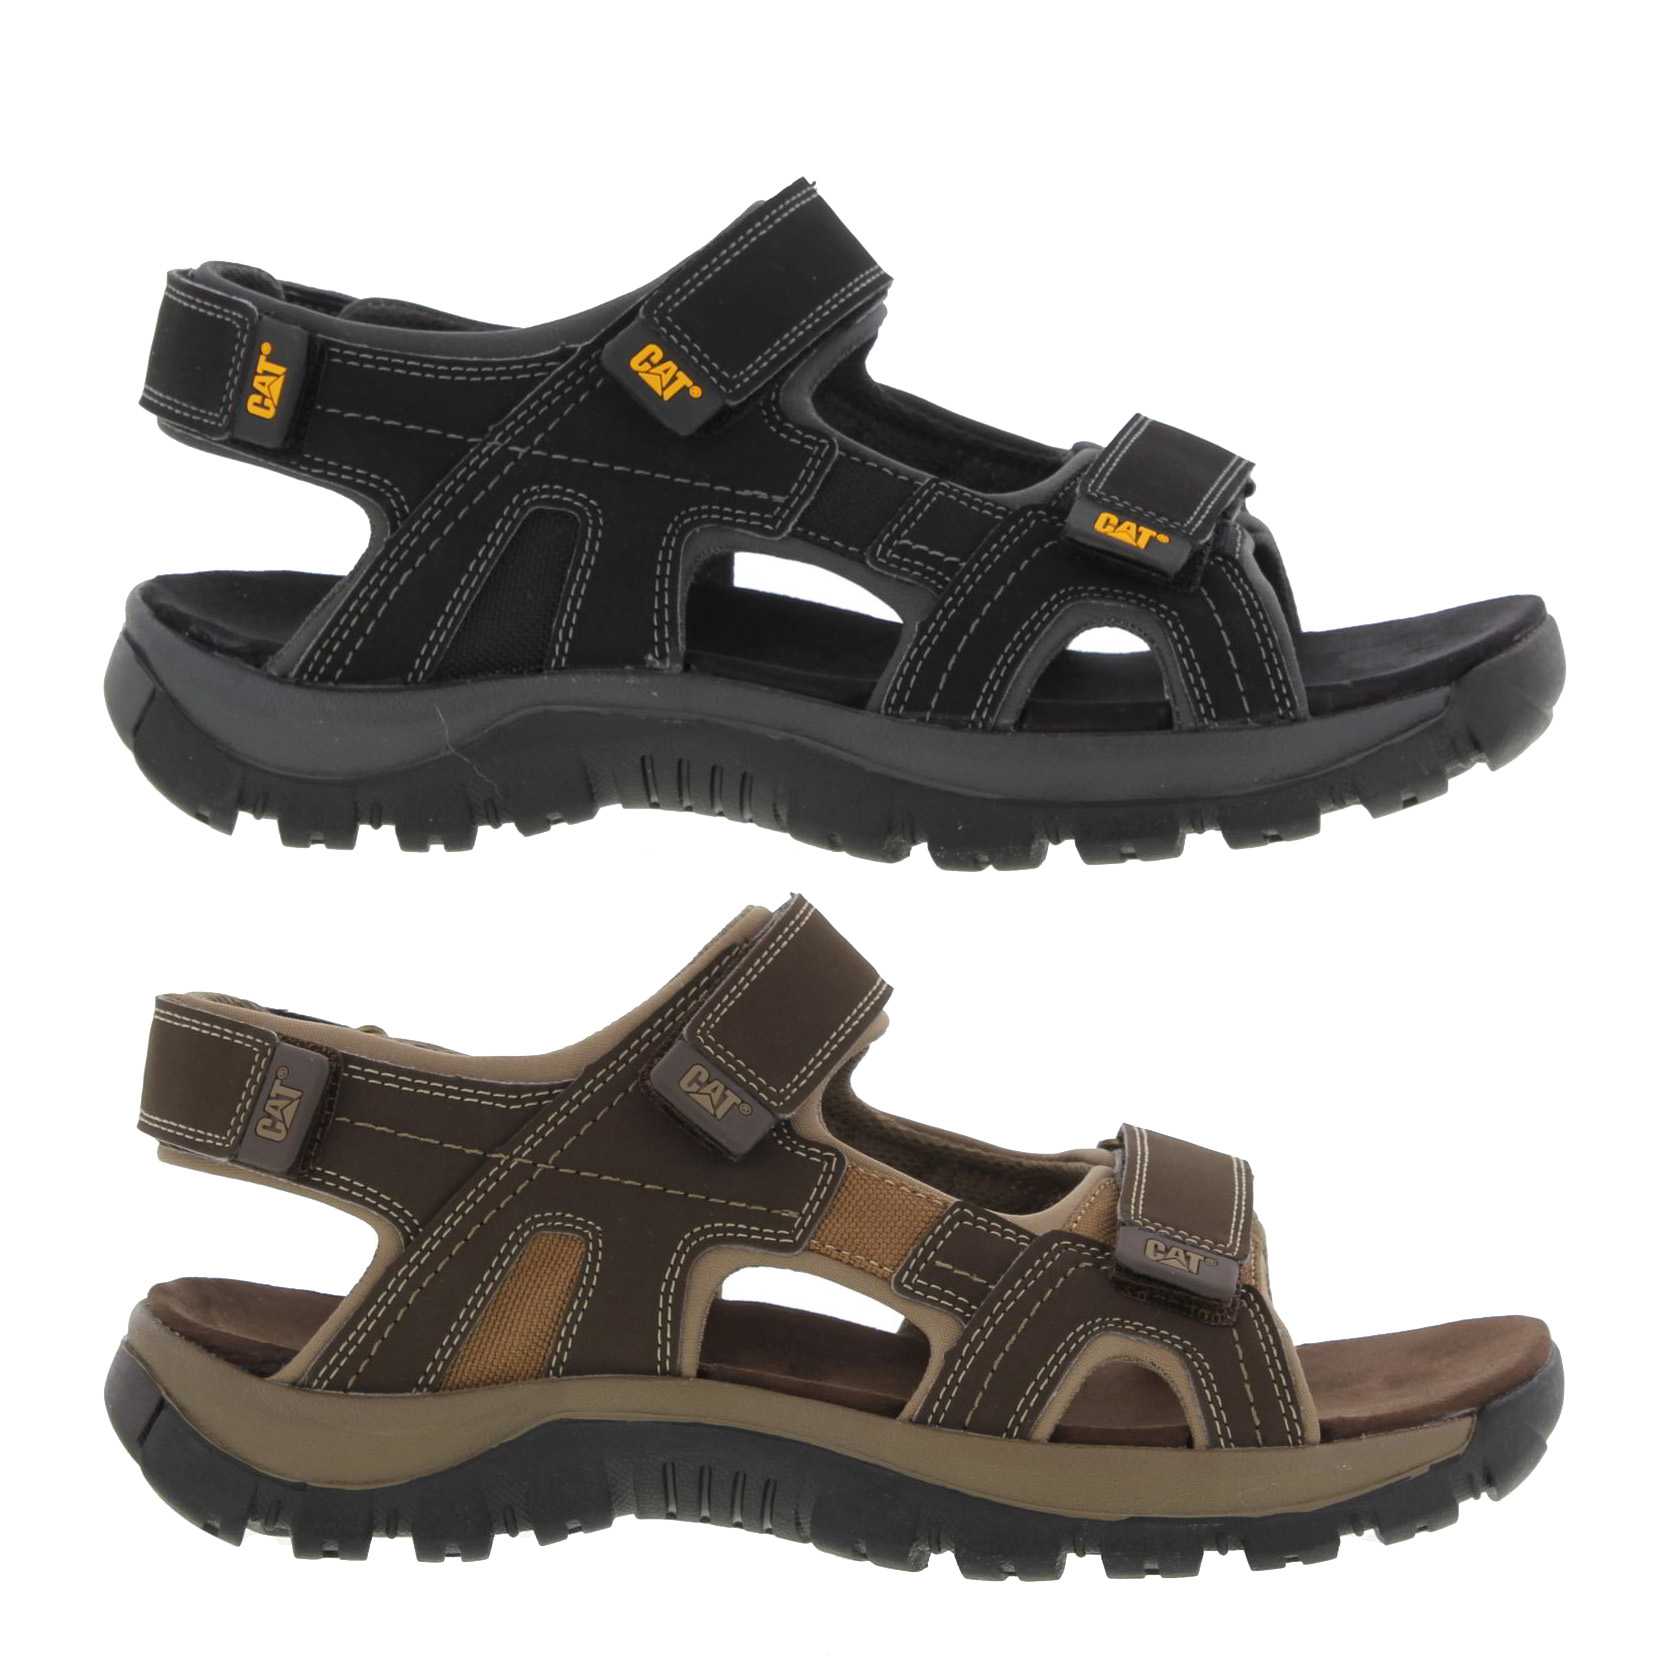 559ade7fa078d Szczegóły o Caterpillar Giles Mens Black Brown Leather Walking Sandals  Sizes UK 7-12